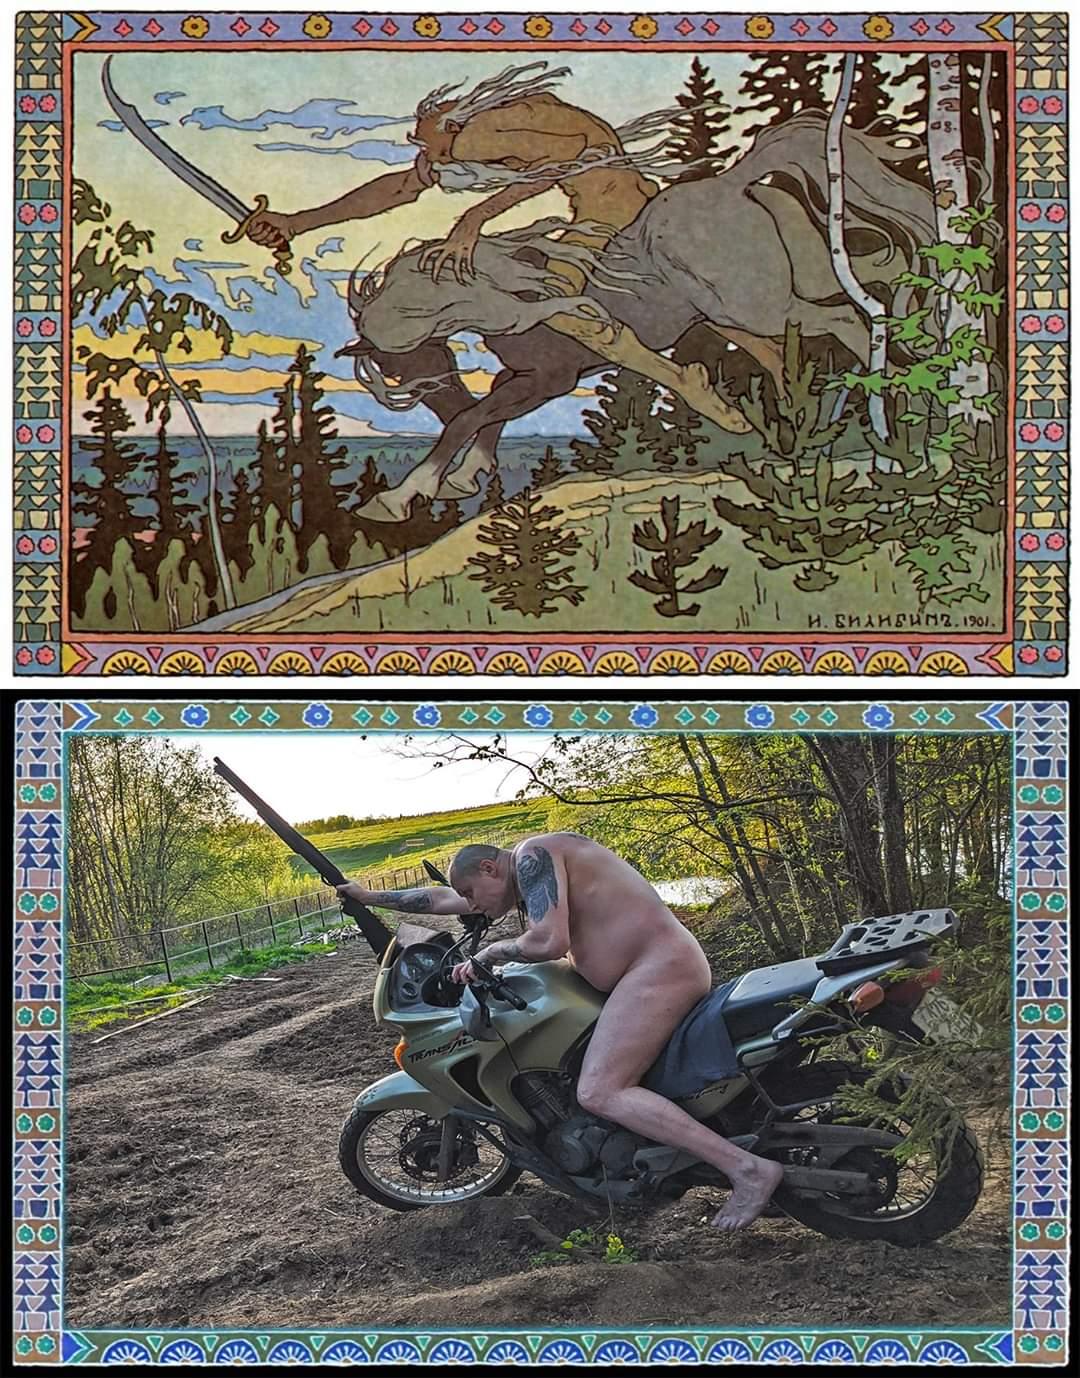 Коще́й Бессме́ртный, Билибин И. 1901 / Коще́й выходит с карантина. 2020